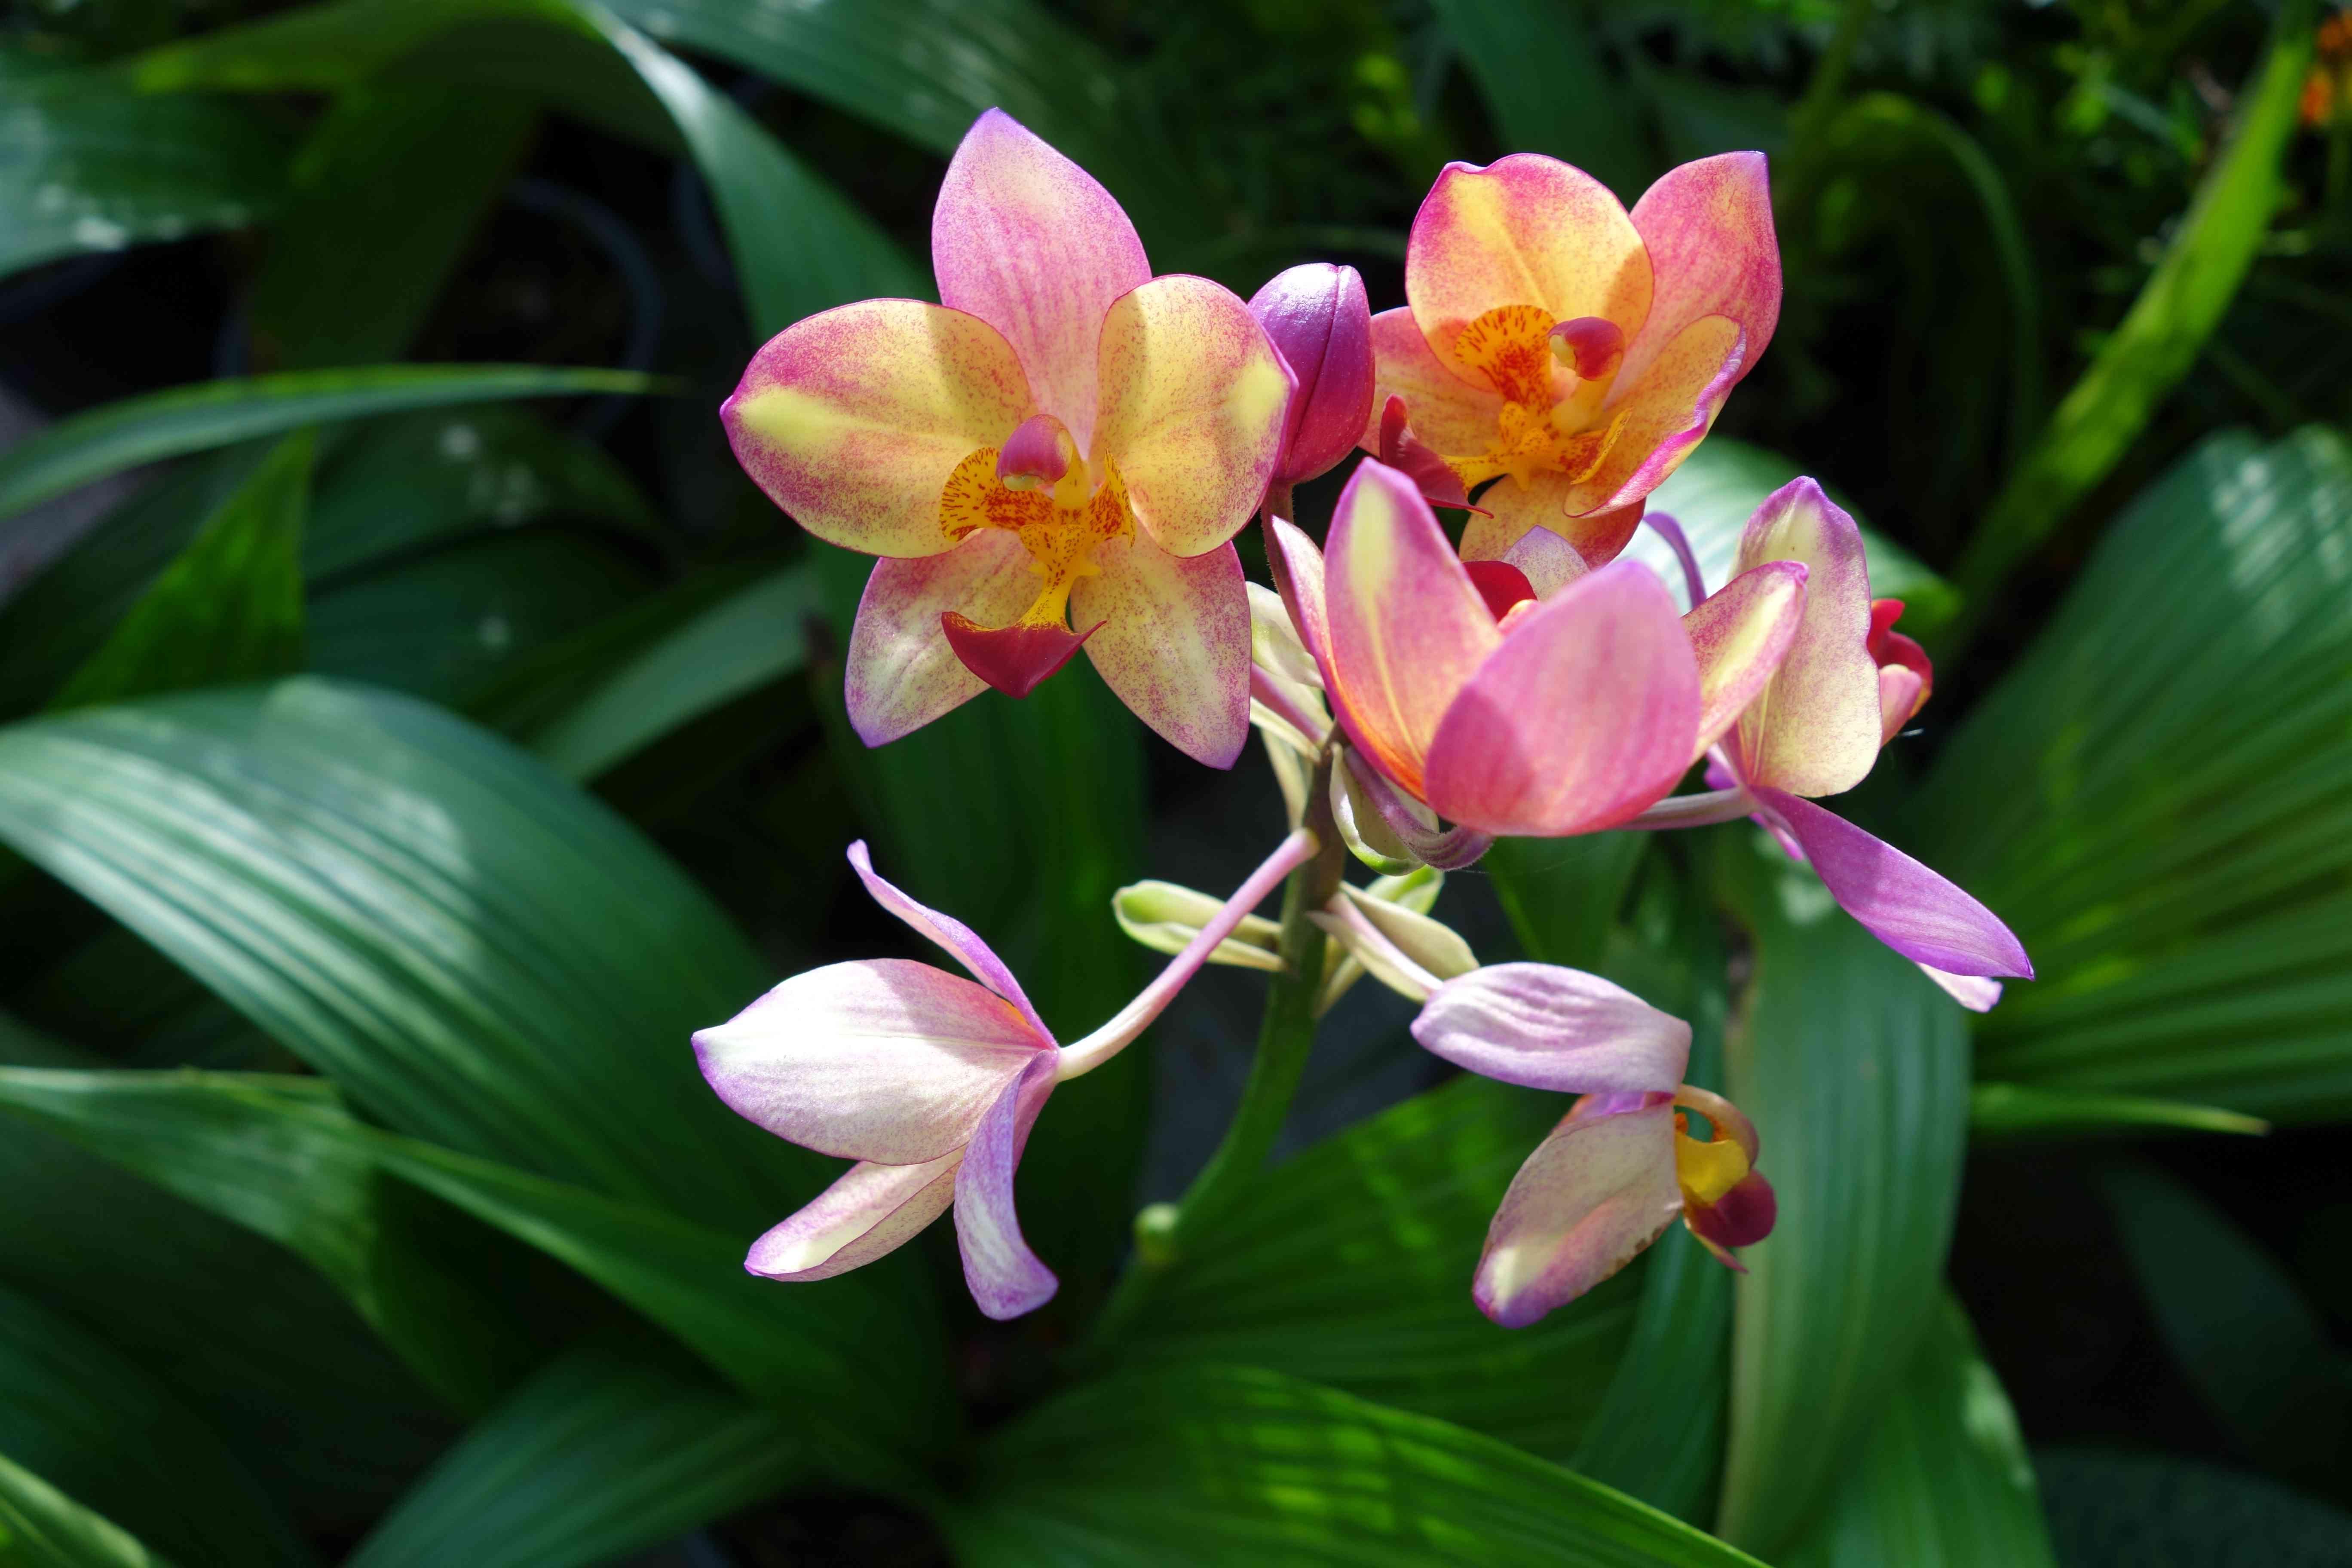 Spathoglottis Plicata orchid